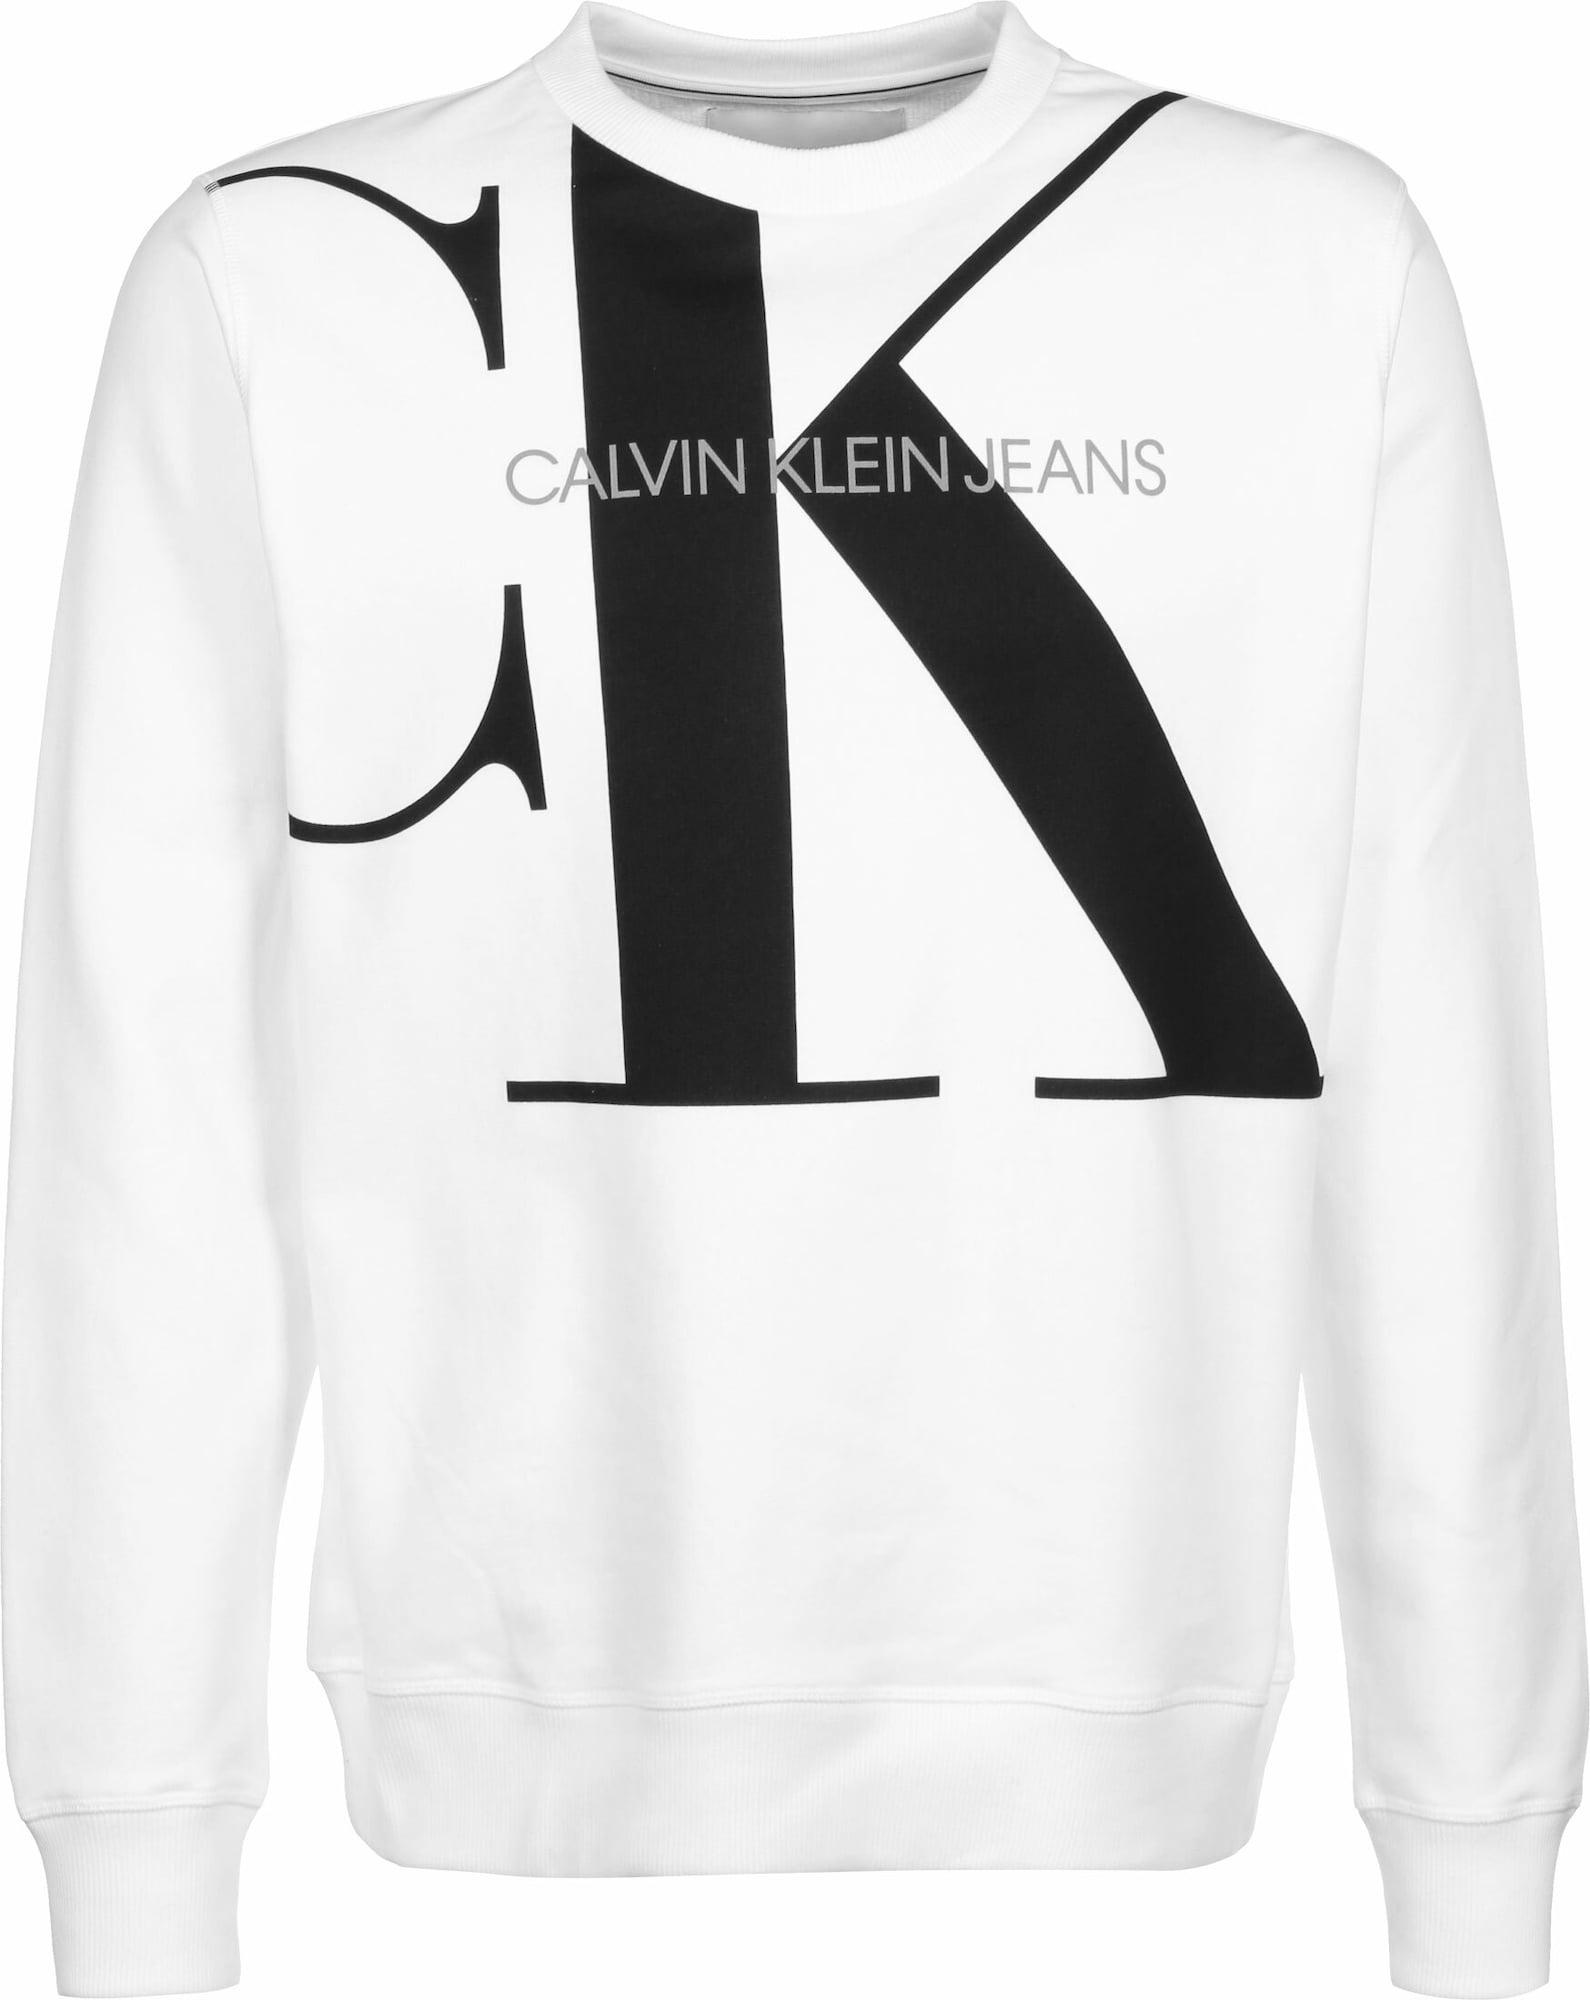 Calvin Klein Jeans Mikina 'Upscale Monogram'  šedá / černá / bílá